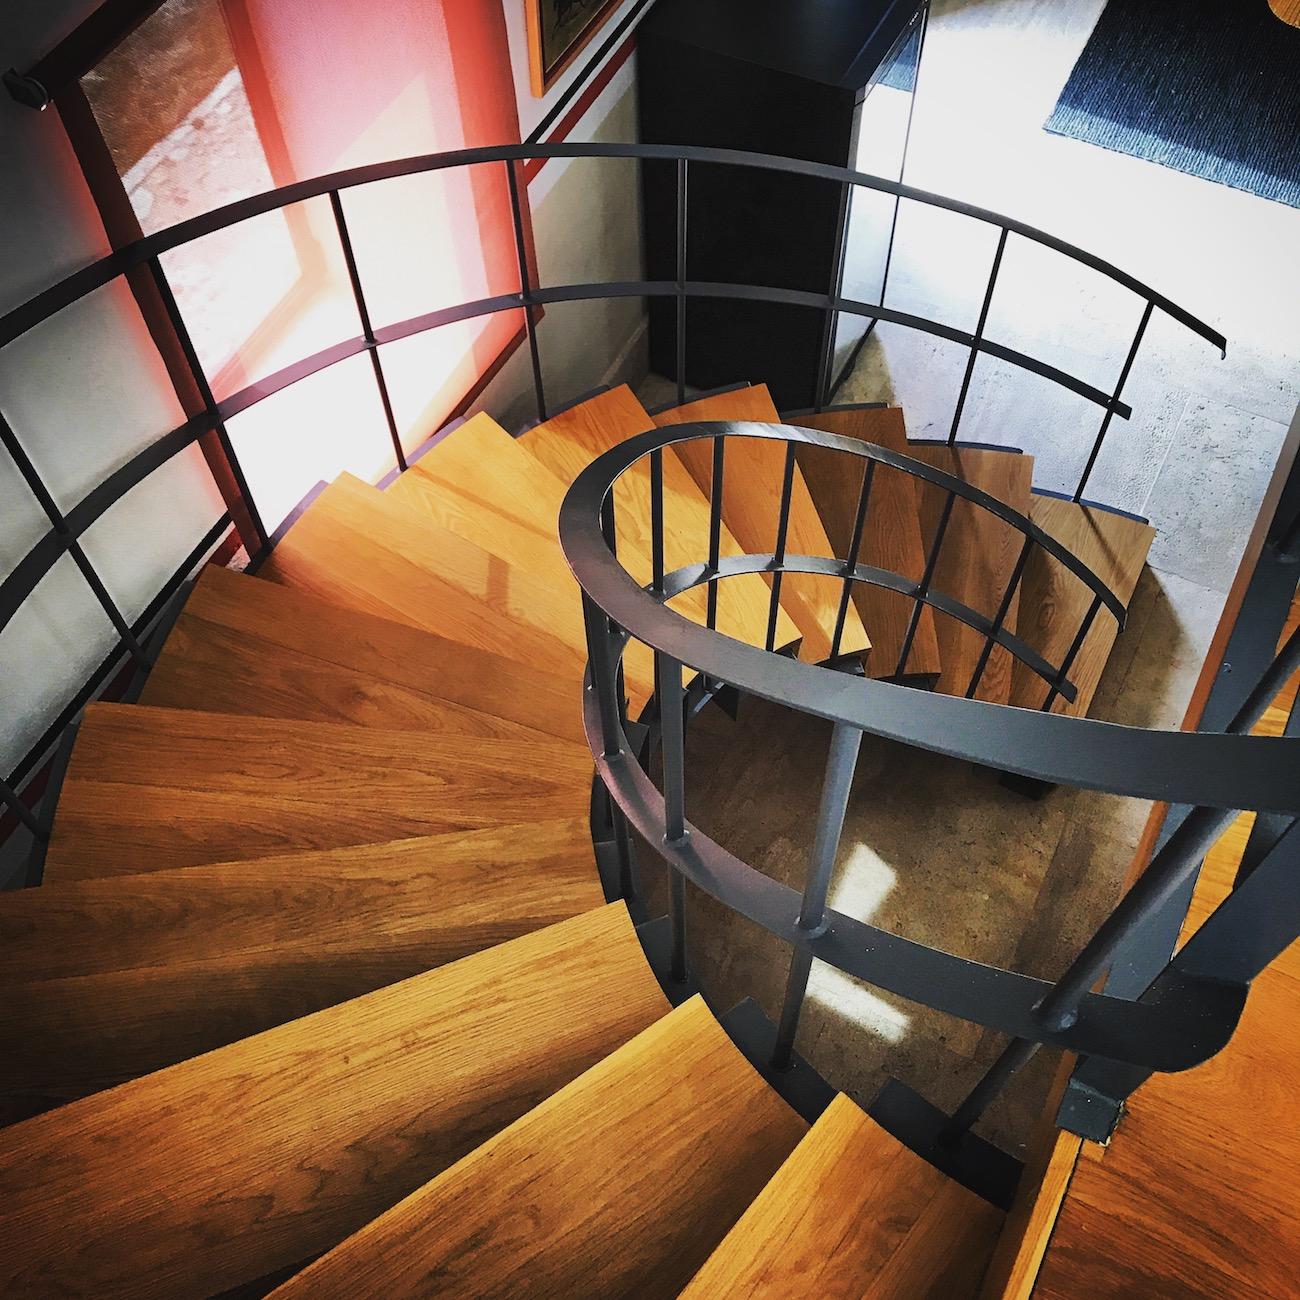 WINE_Arrayan Stairs.jpg